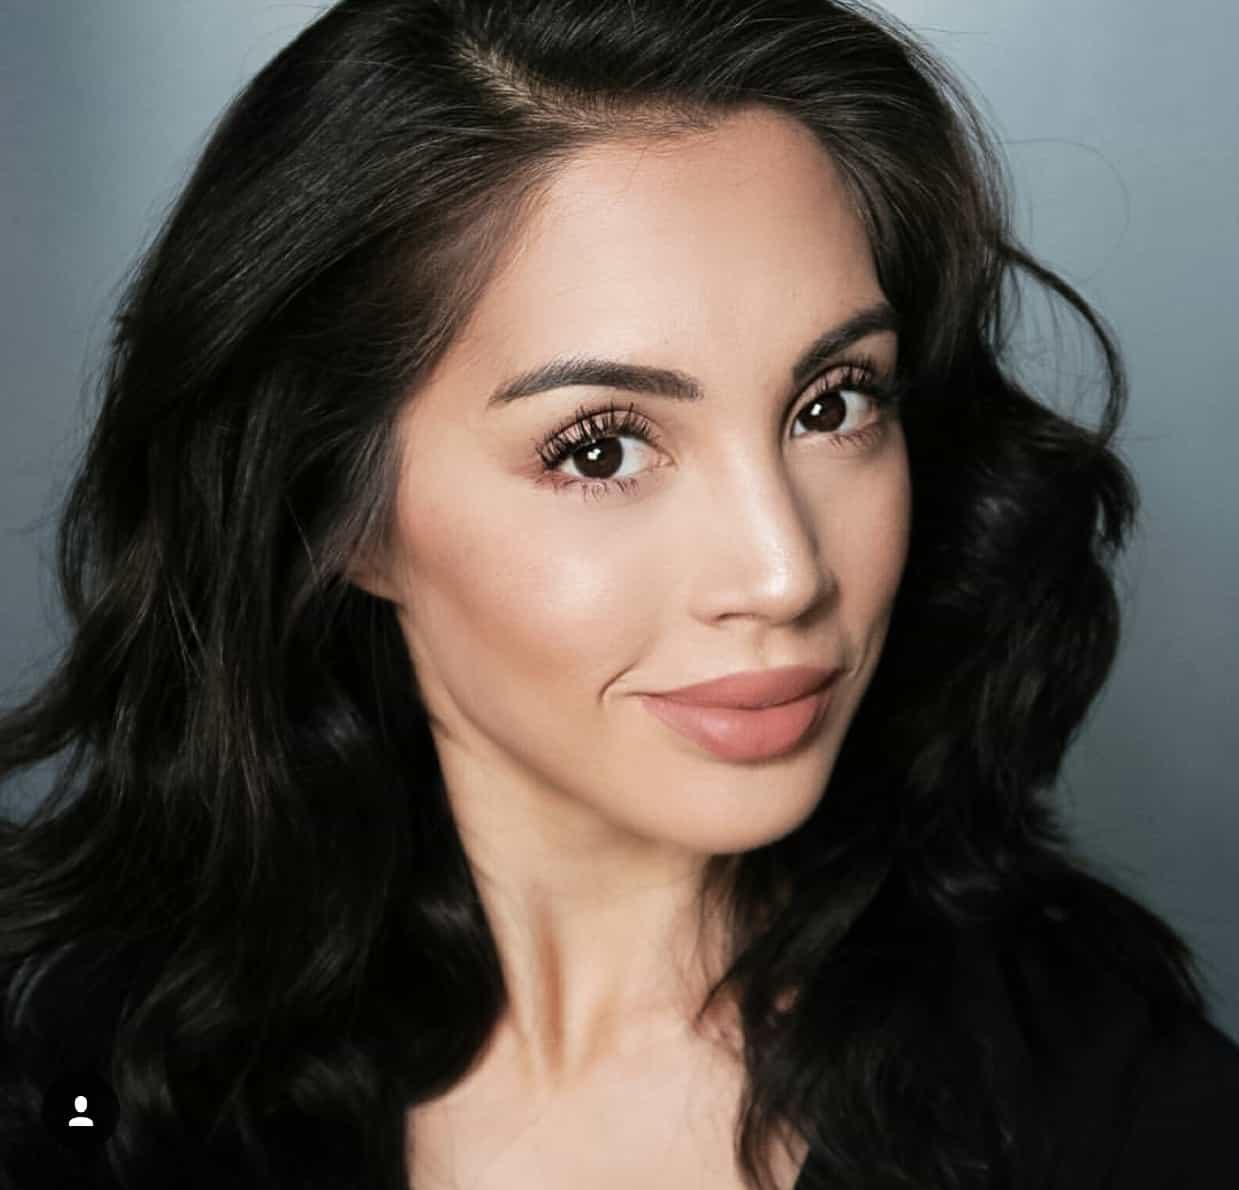 Makeup Artist Feature of the Month Cinderella Merz